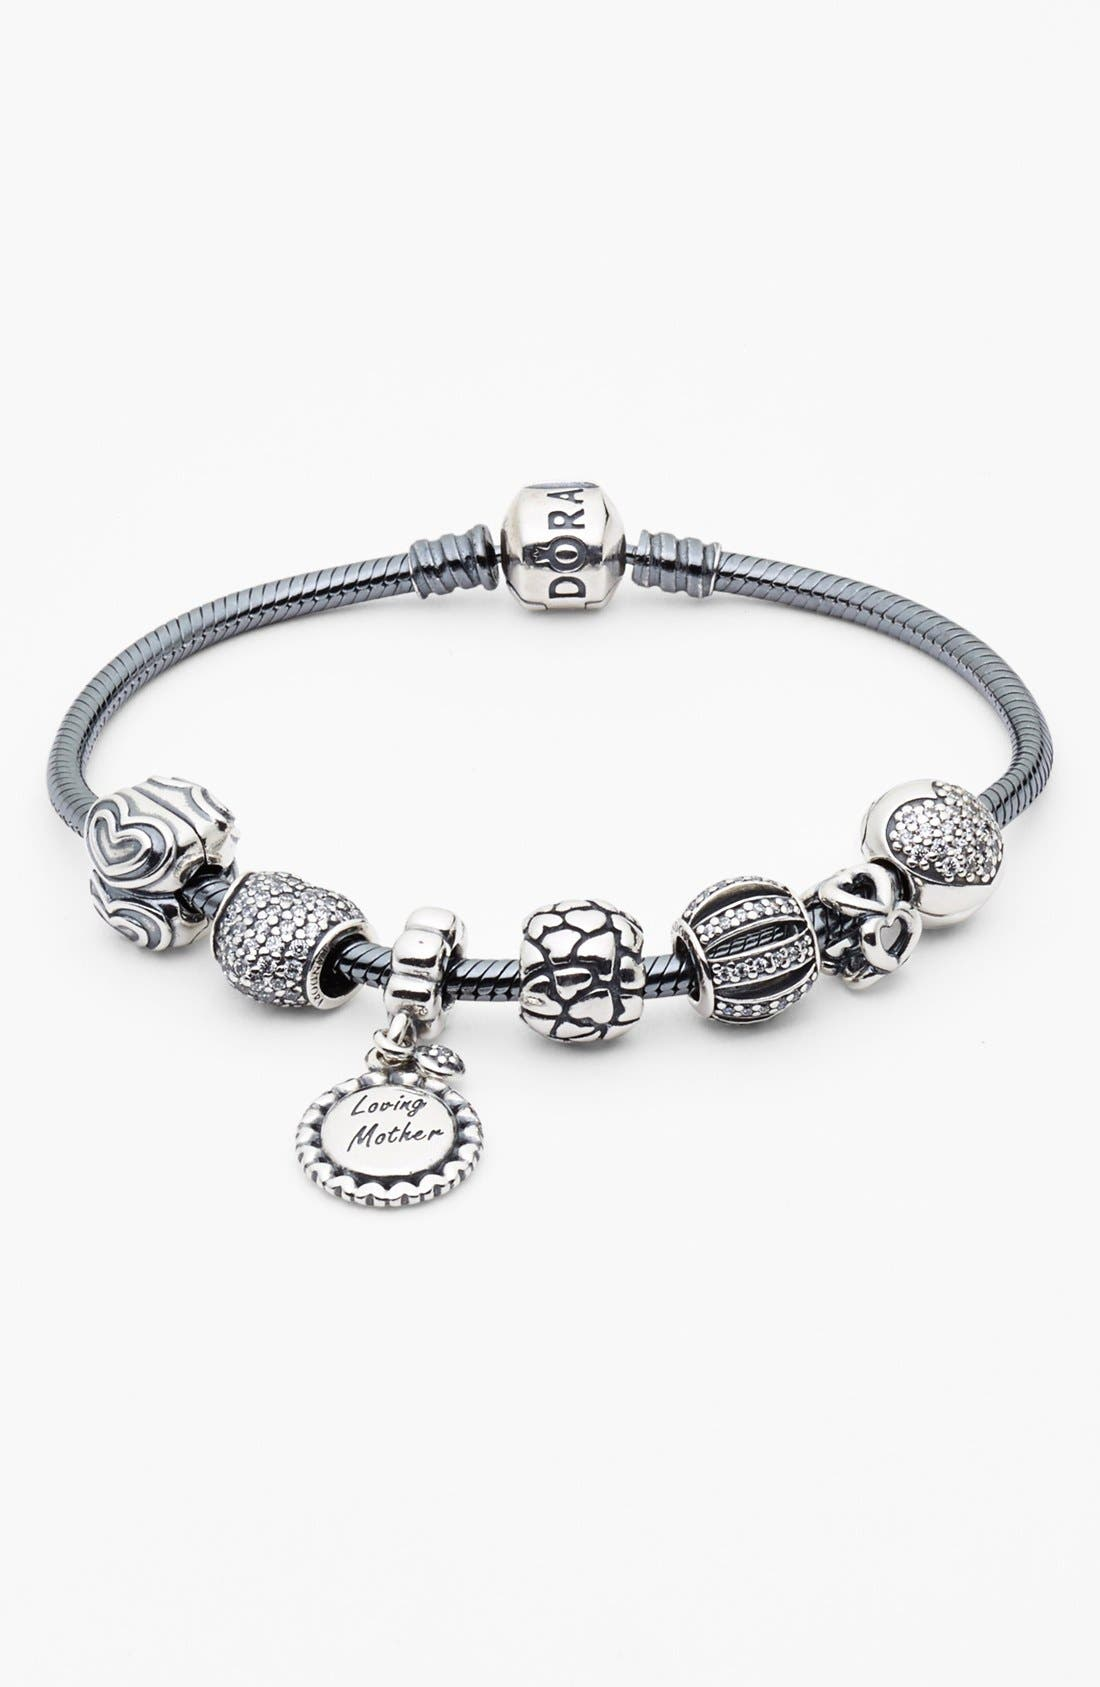 Oxidized Sterling Silver Charm Bracelet,                             Alternate thumbnail 4, color,